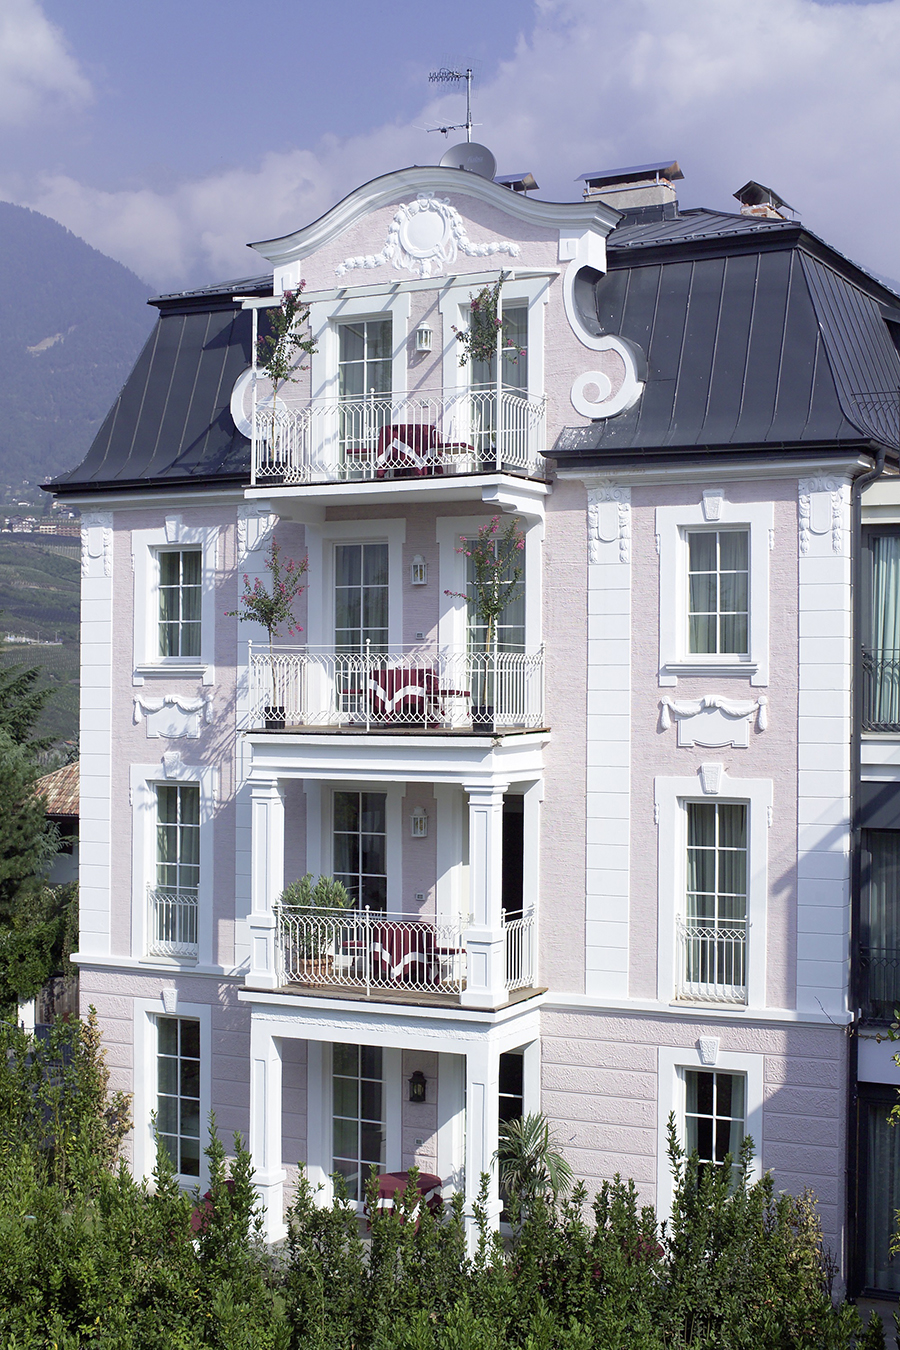 Meisters Hotel Irma_Villa Amore.jpg